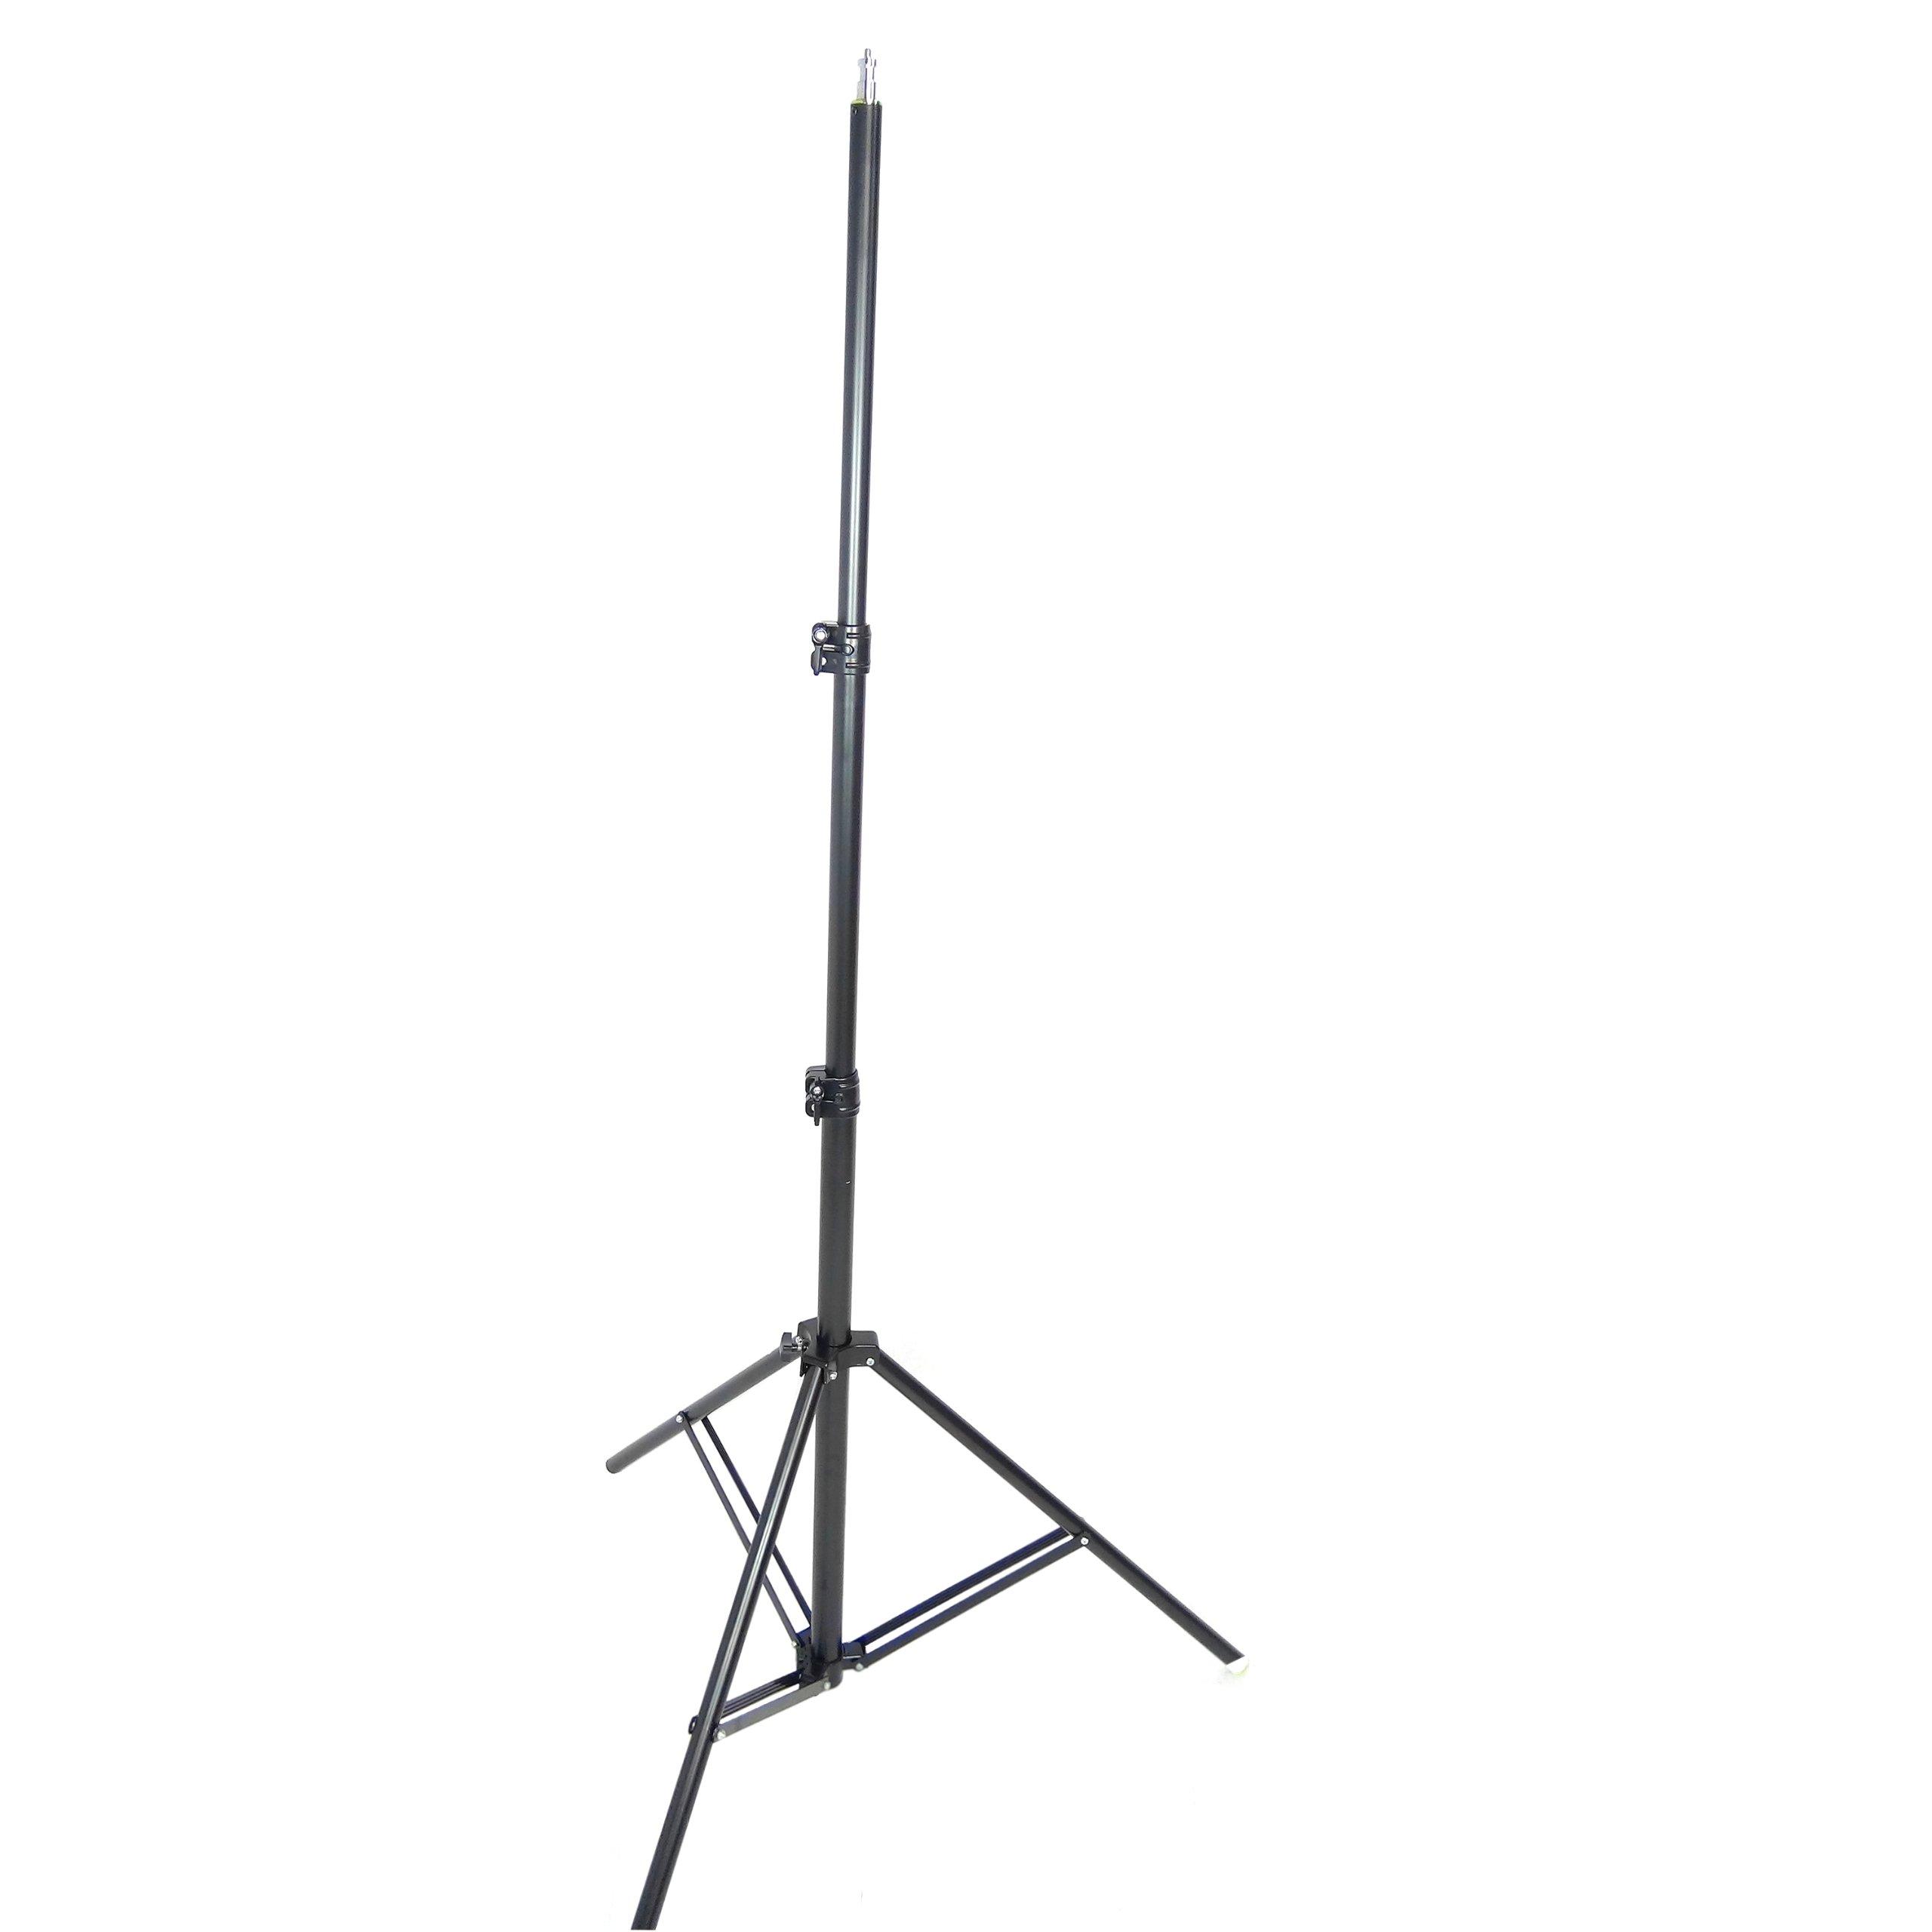 DynaSun W957 - Soporte de equipos de iluminación fotográfica, negro product image